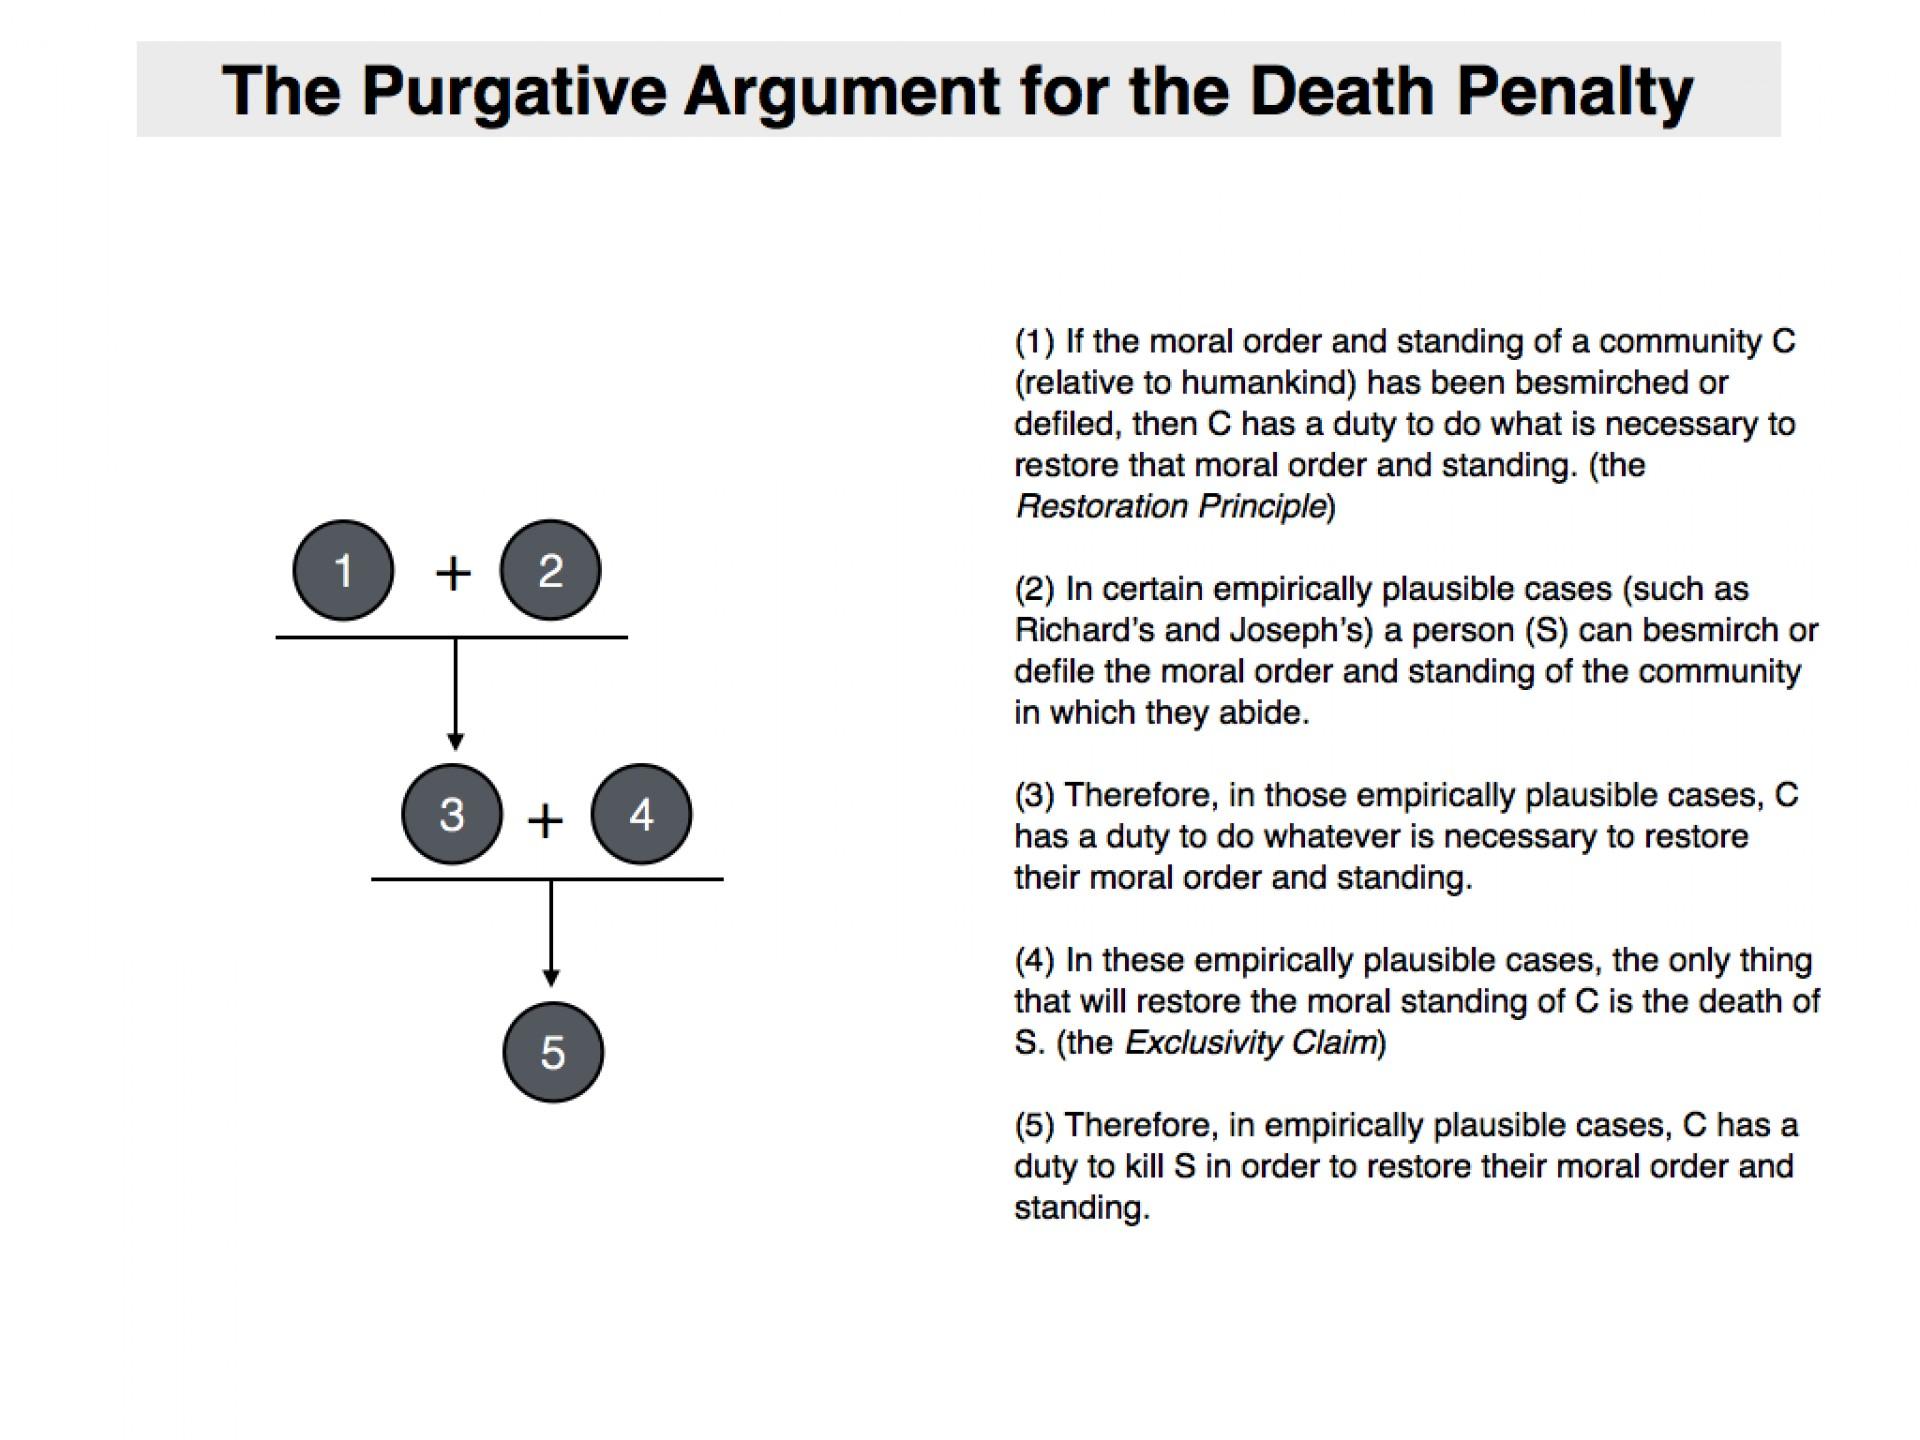 018 Pro Death Penalty Essay Example Purgativeargumentfordeathpenalty Fearsome Con Debate Argumentative Outline 1920